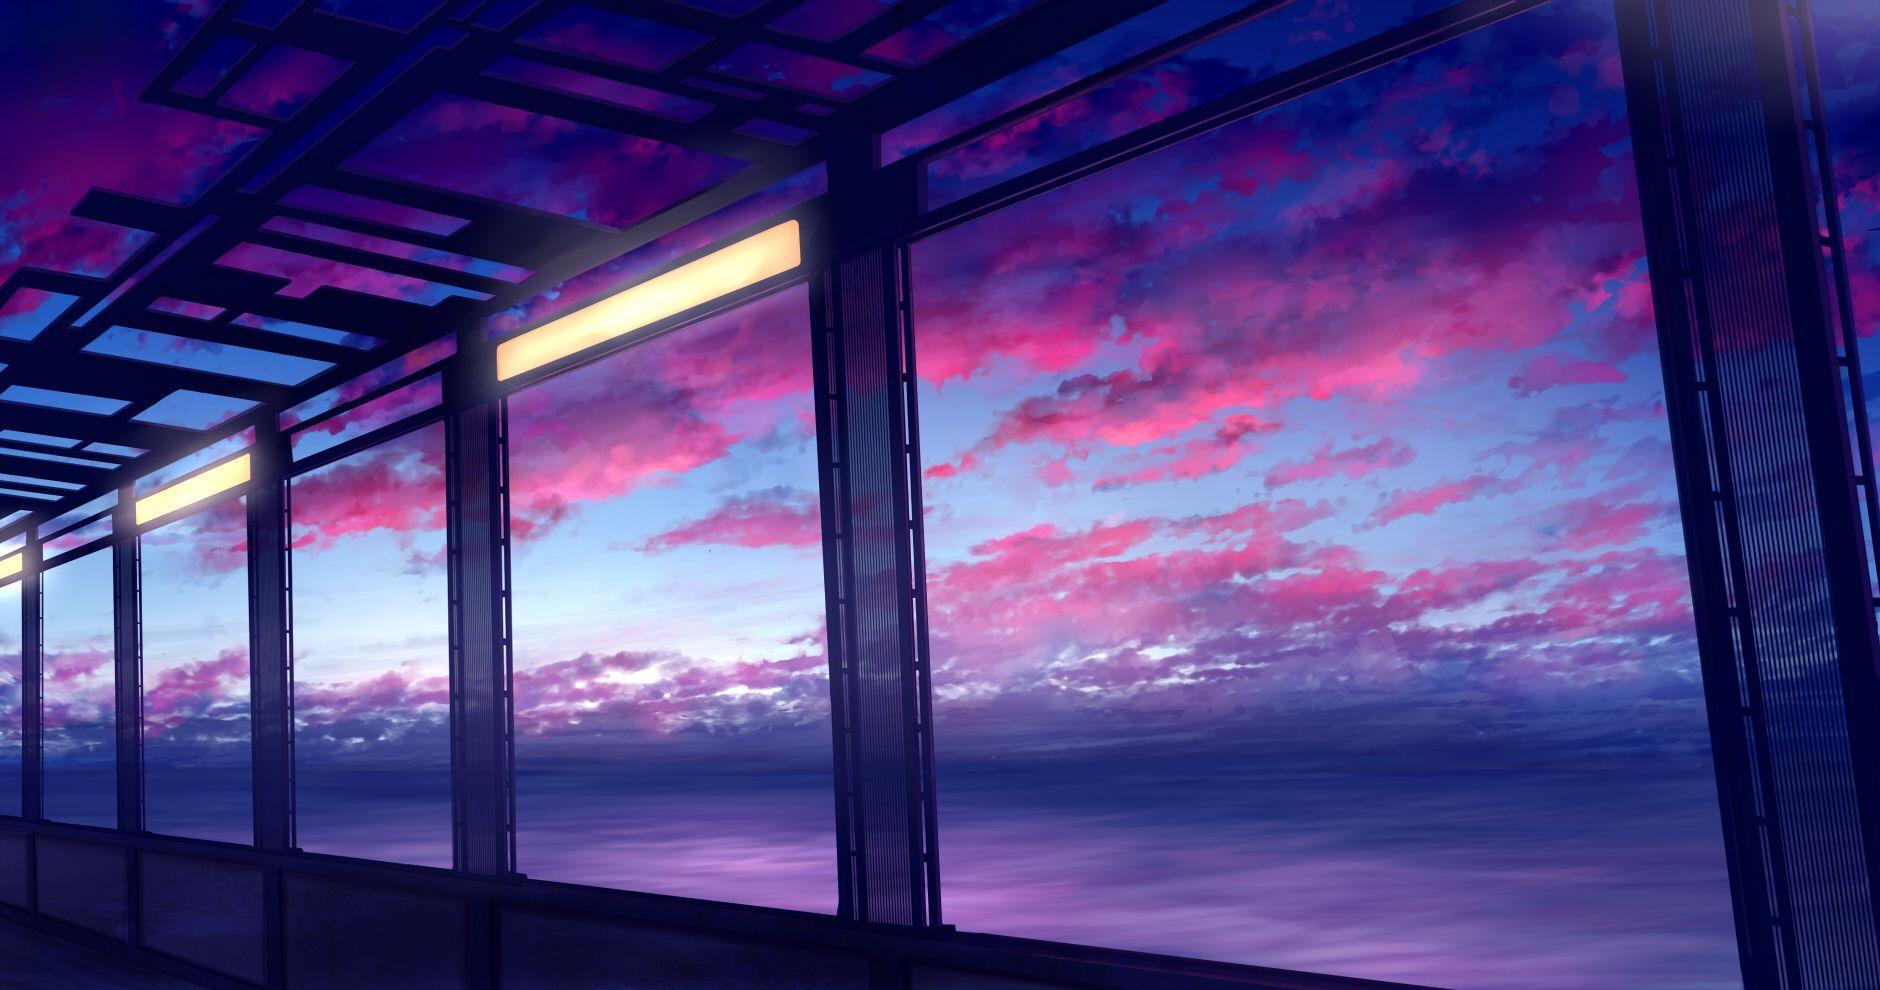 Purple Anime Scenery Wallpapers Top Free Purple Anime Scenery